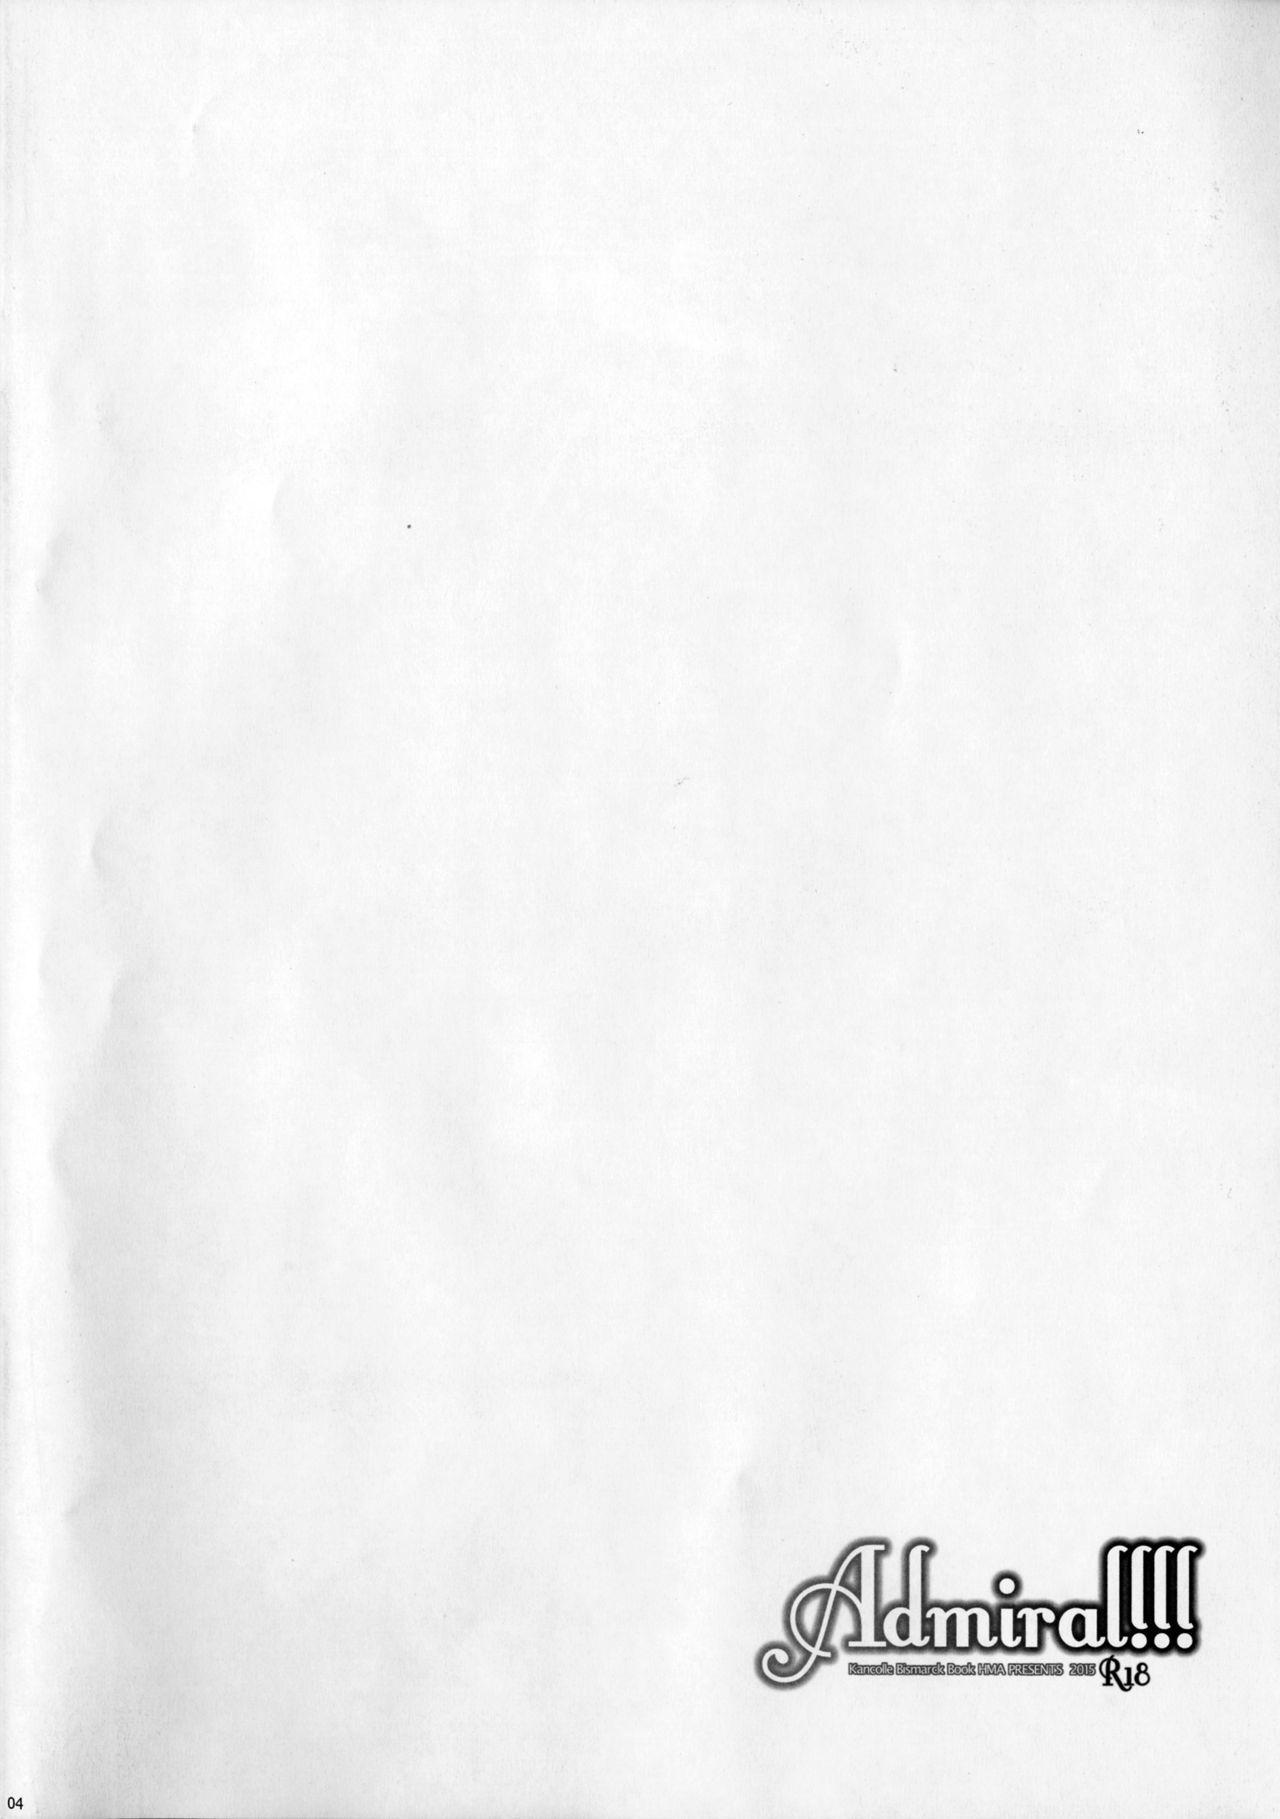 Admiral!!! + Omake Paper 2